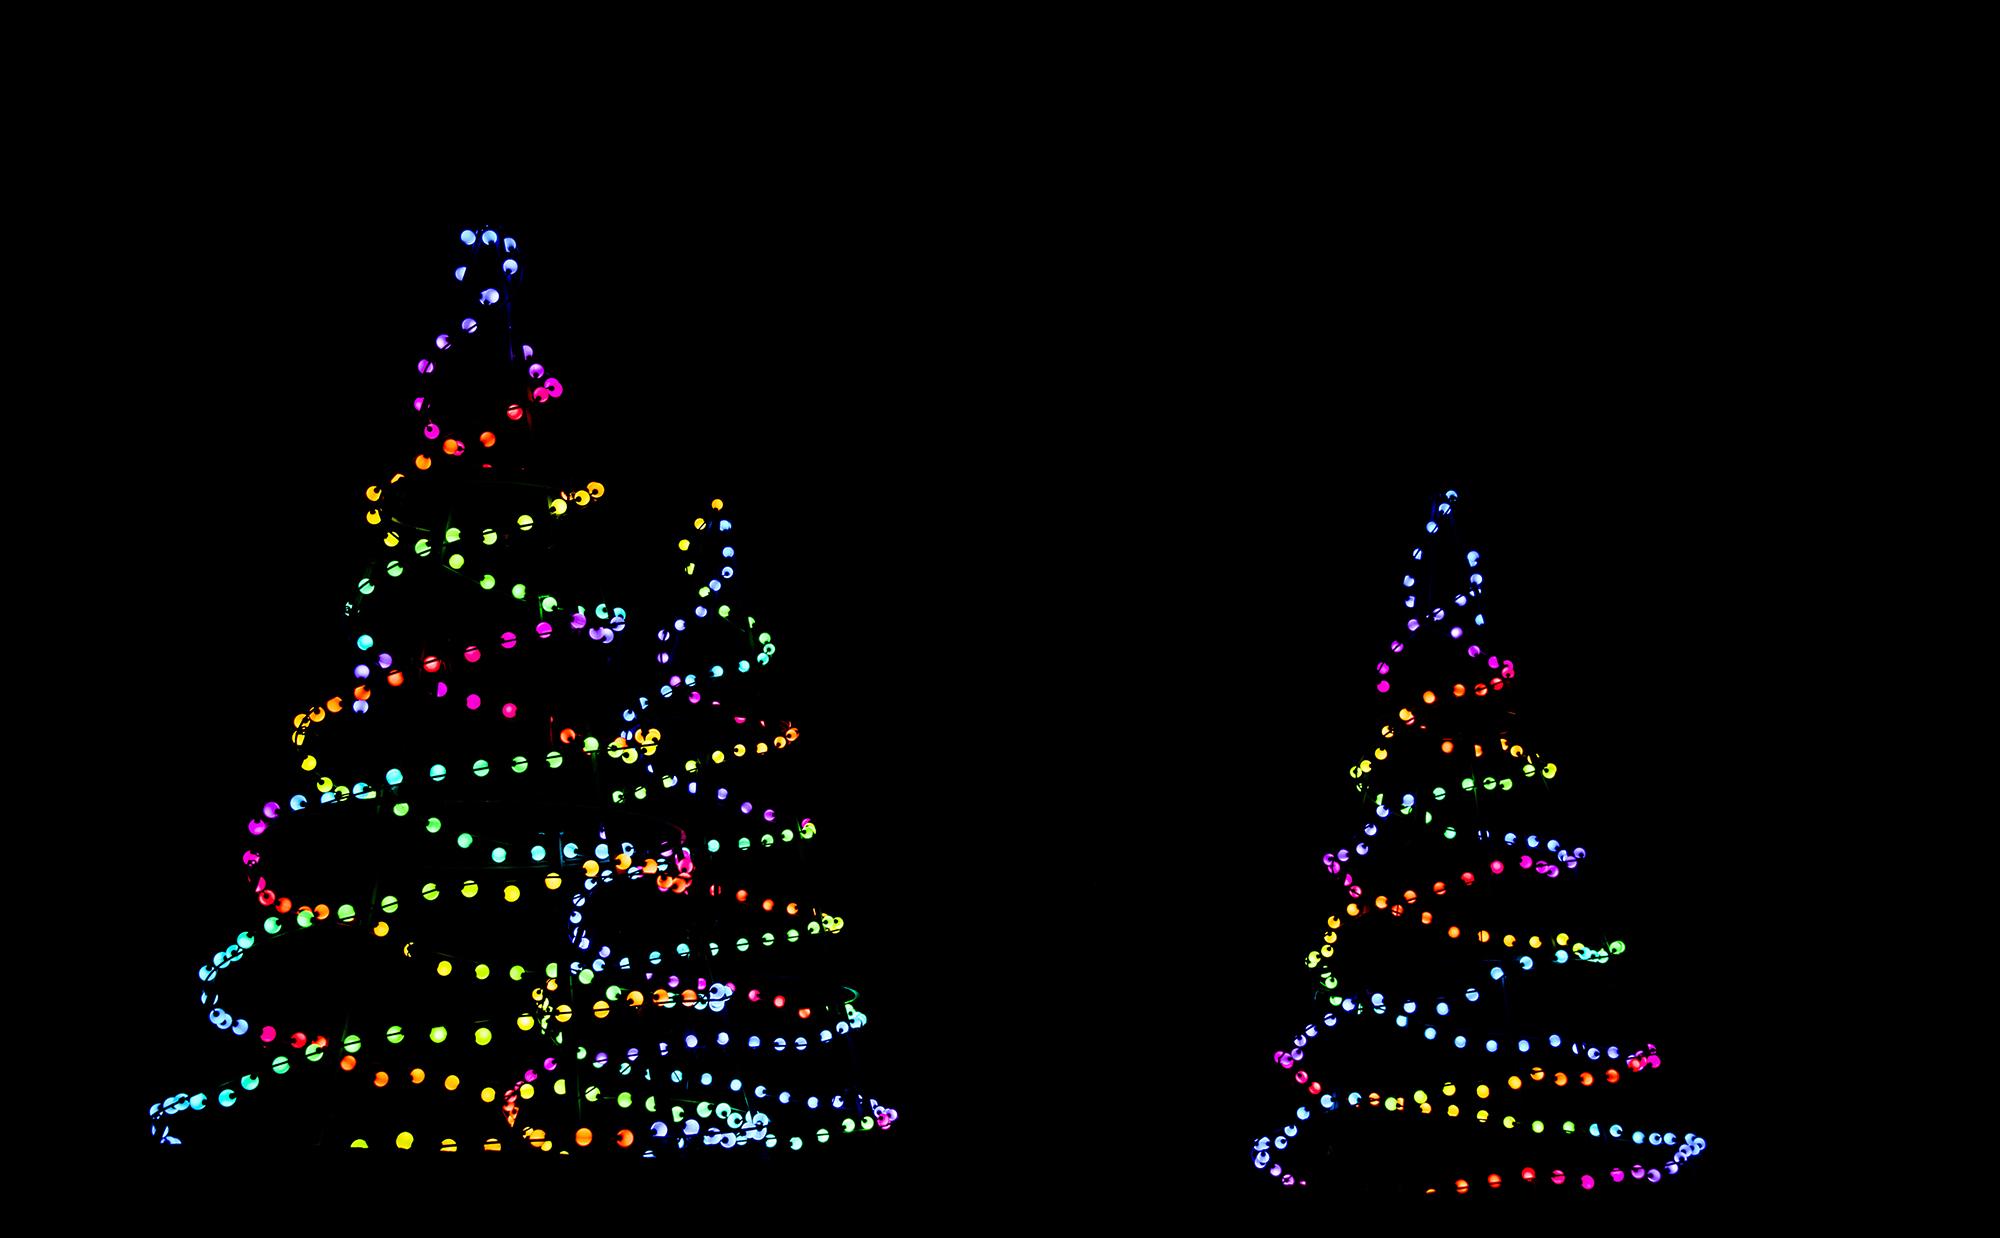 zoolights1_4low.jpg